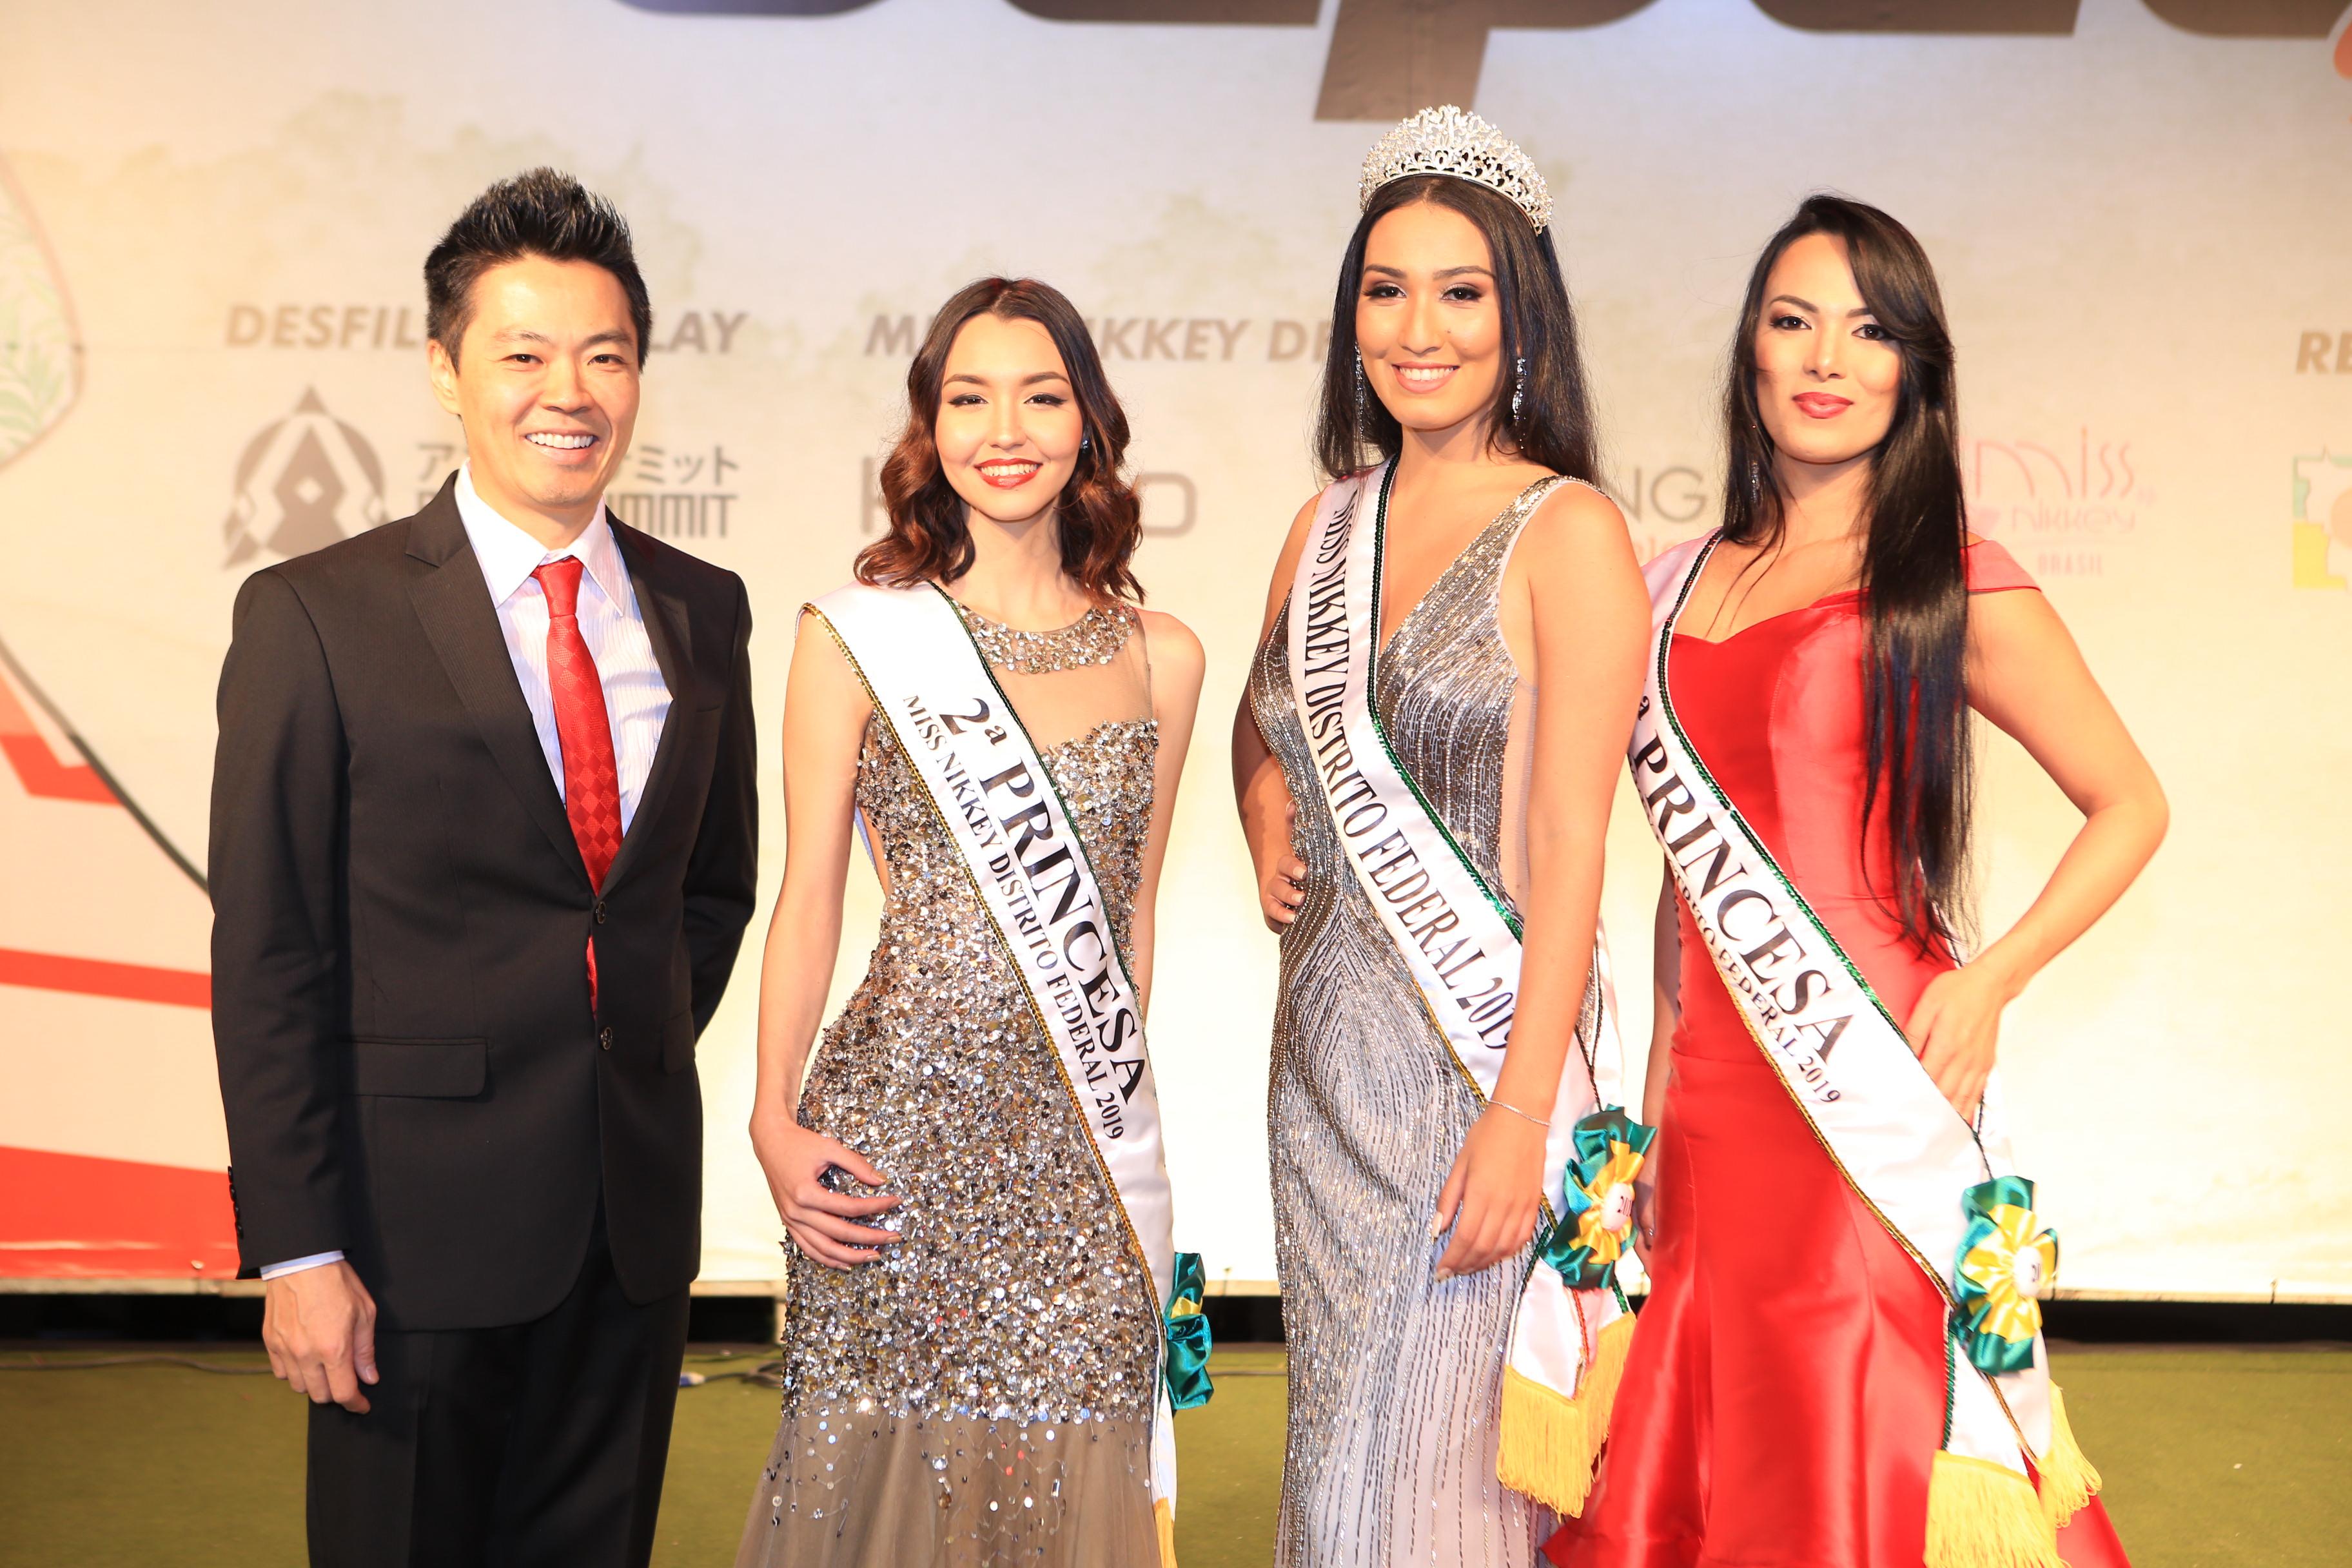 Miss Nikkey Distrito Federal 2019